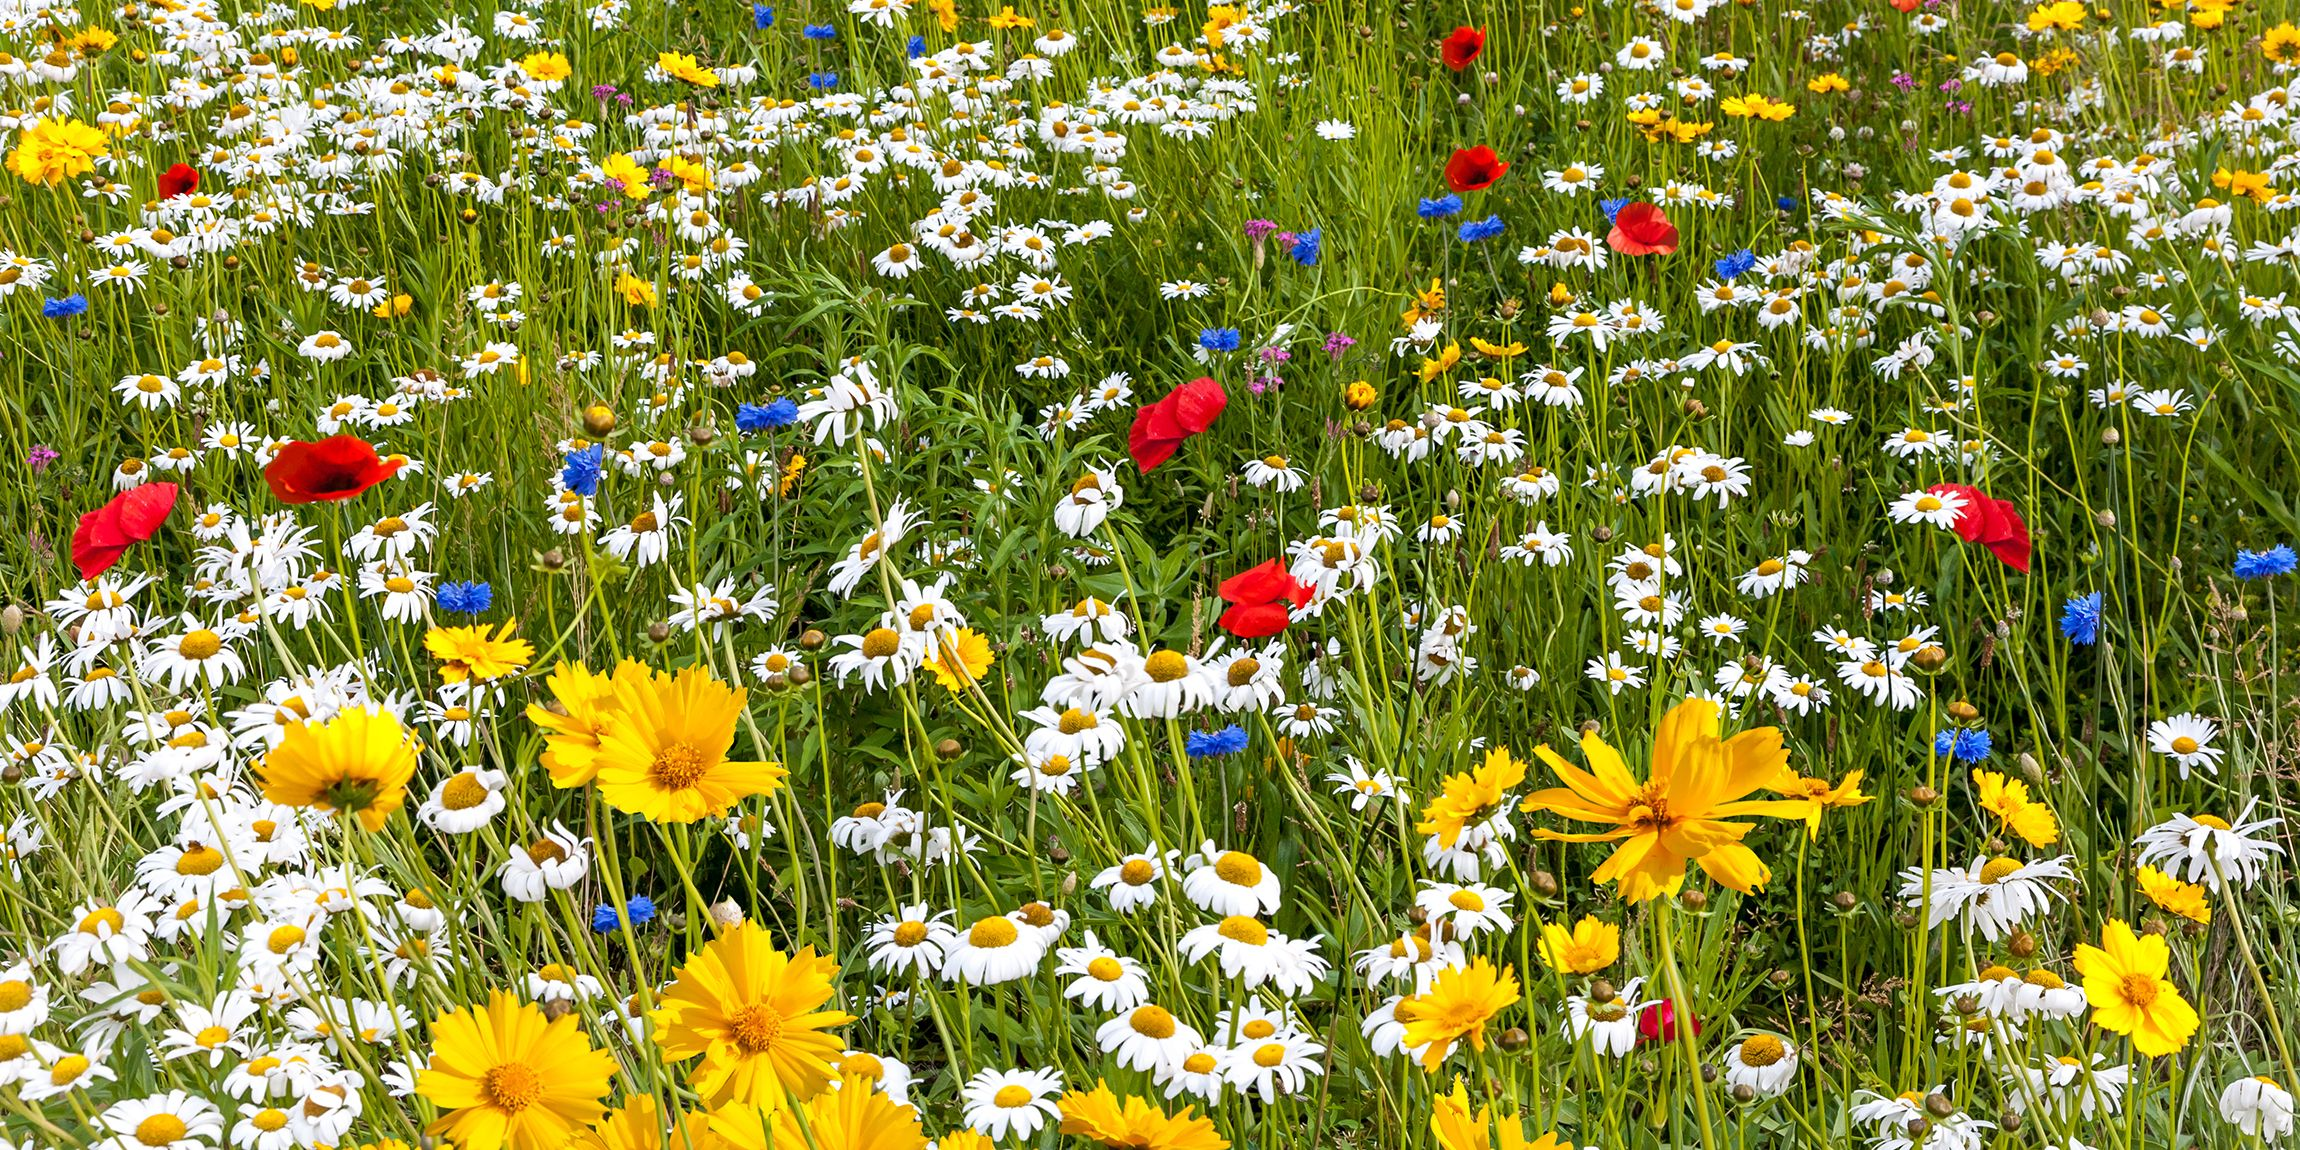 Outdoor Gardening Ideas Gardens garden ideas design and decor for outdoor living gardens outdoor living workwithnaturefo